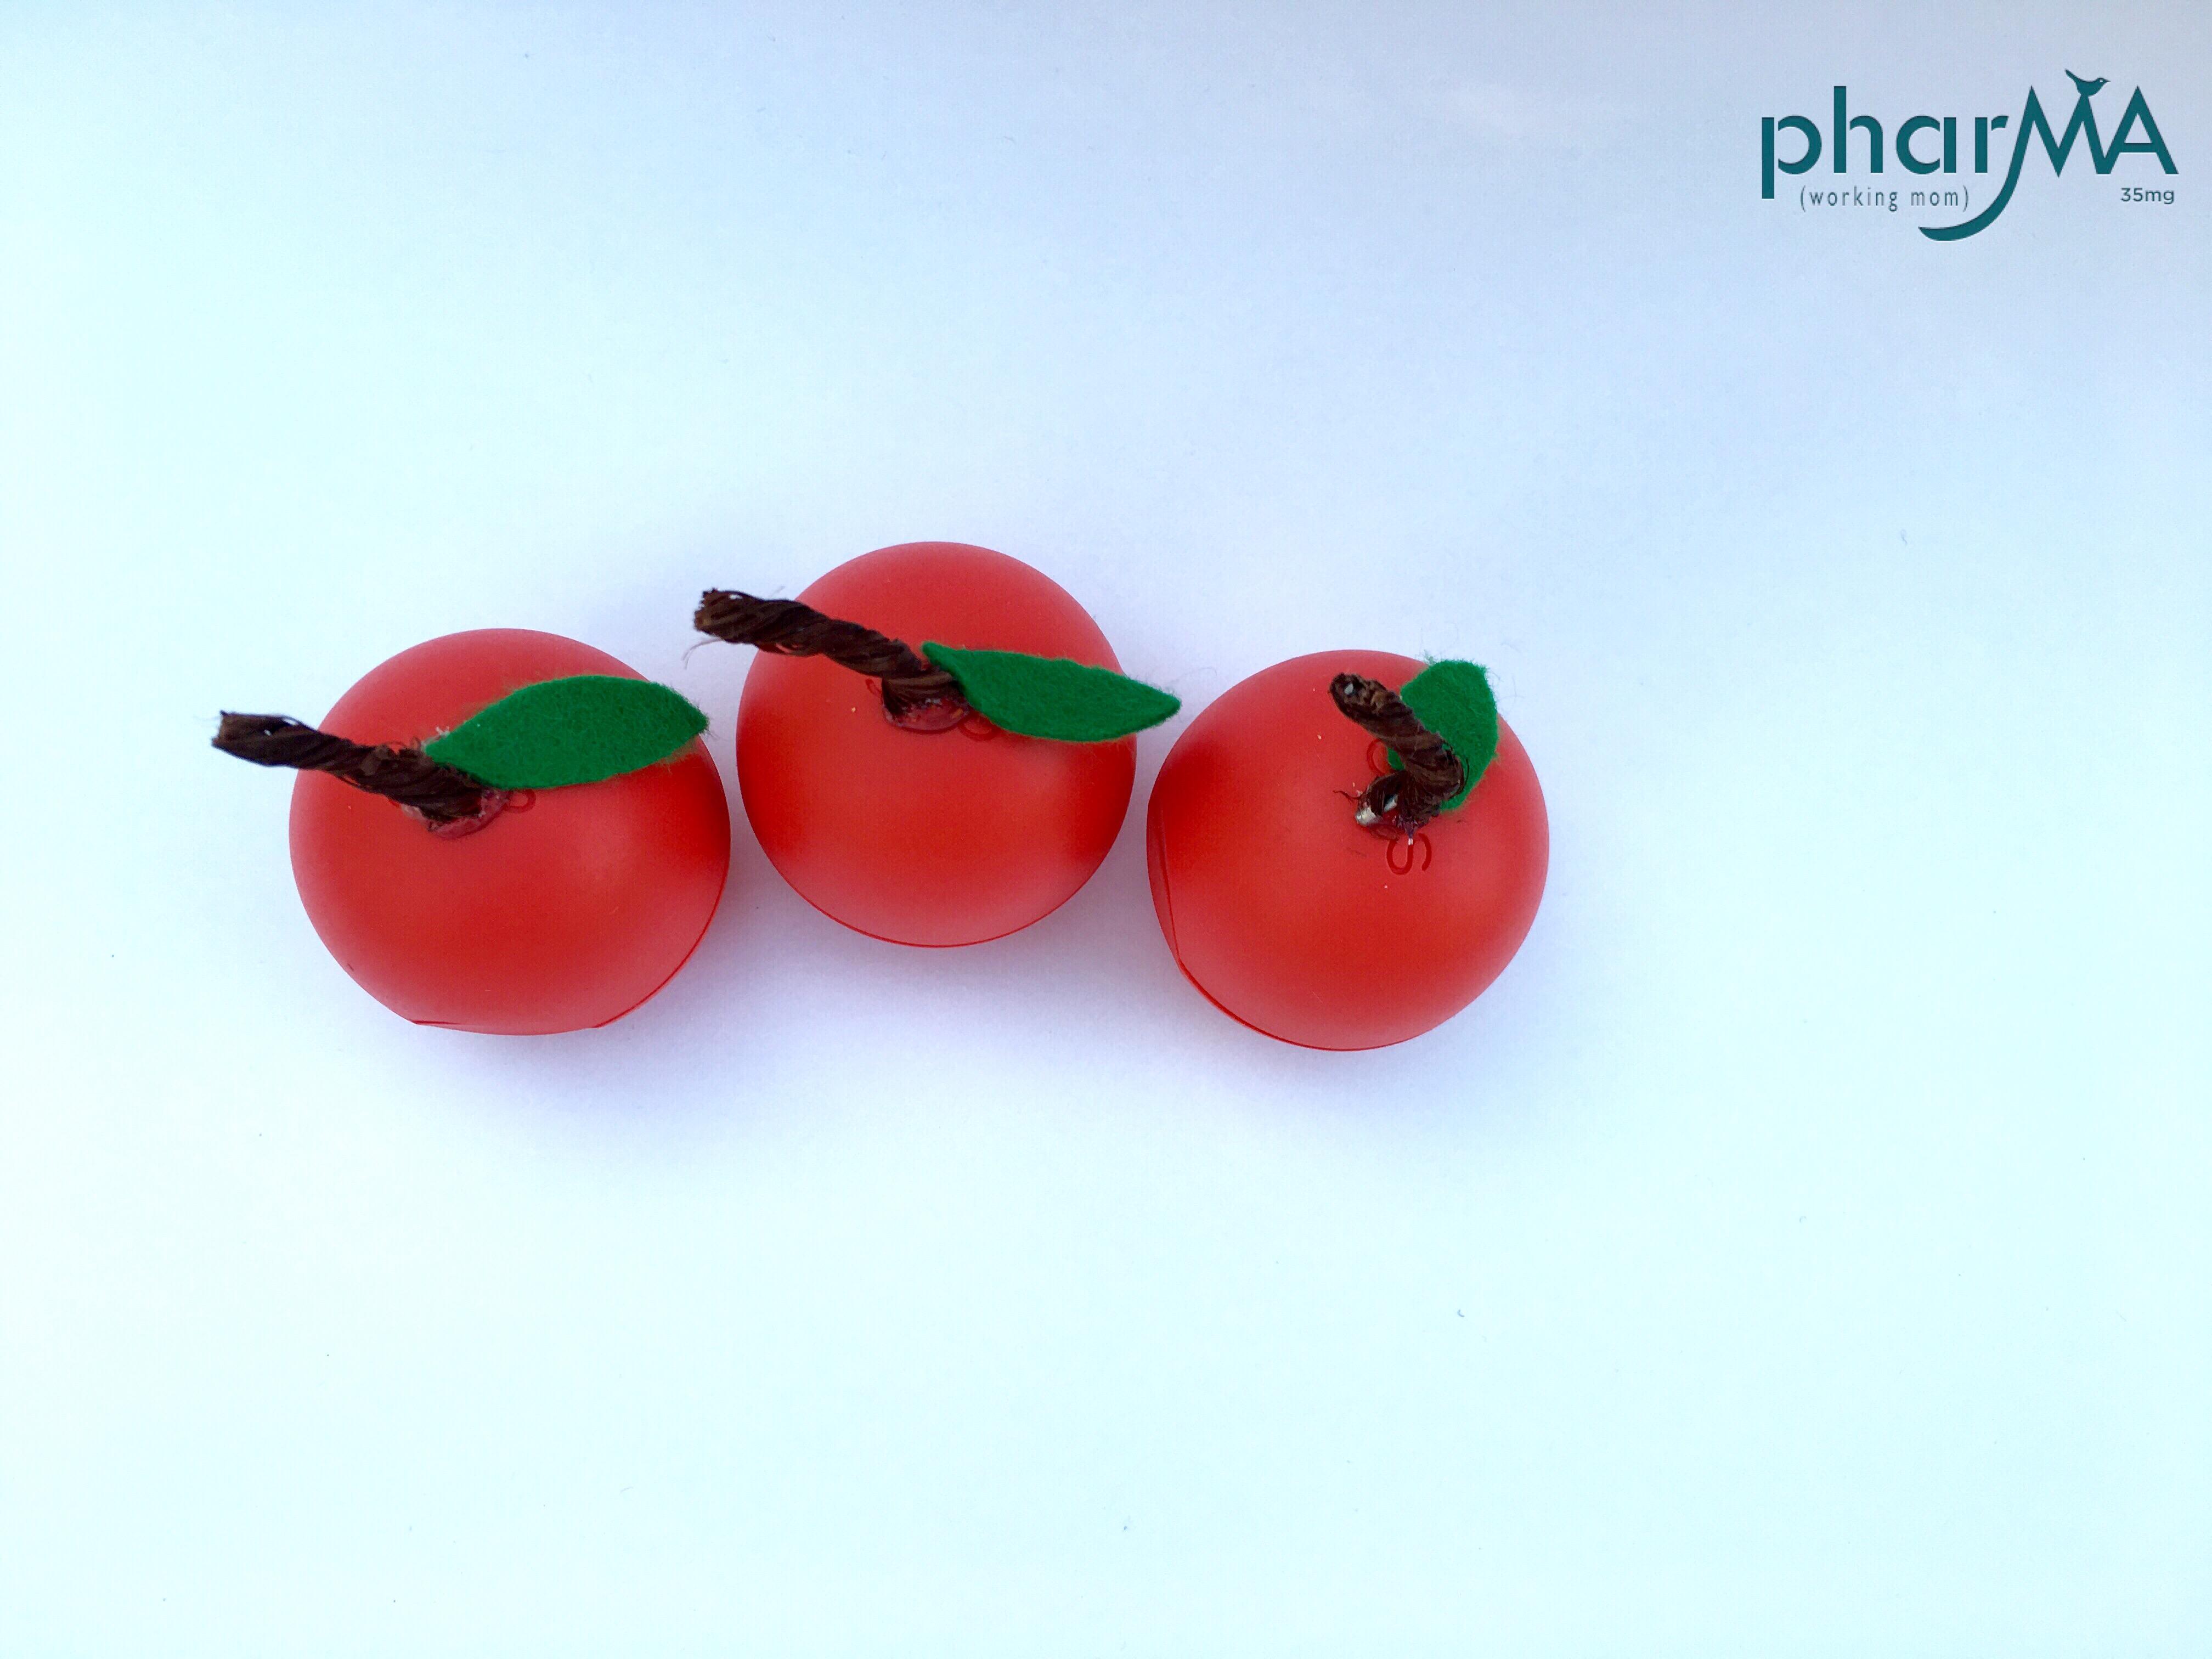 EOS DIY fruit, teacher appreciation, the PharMA blog, diy gift